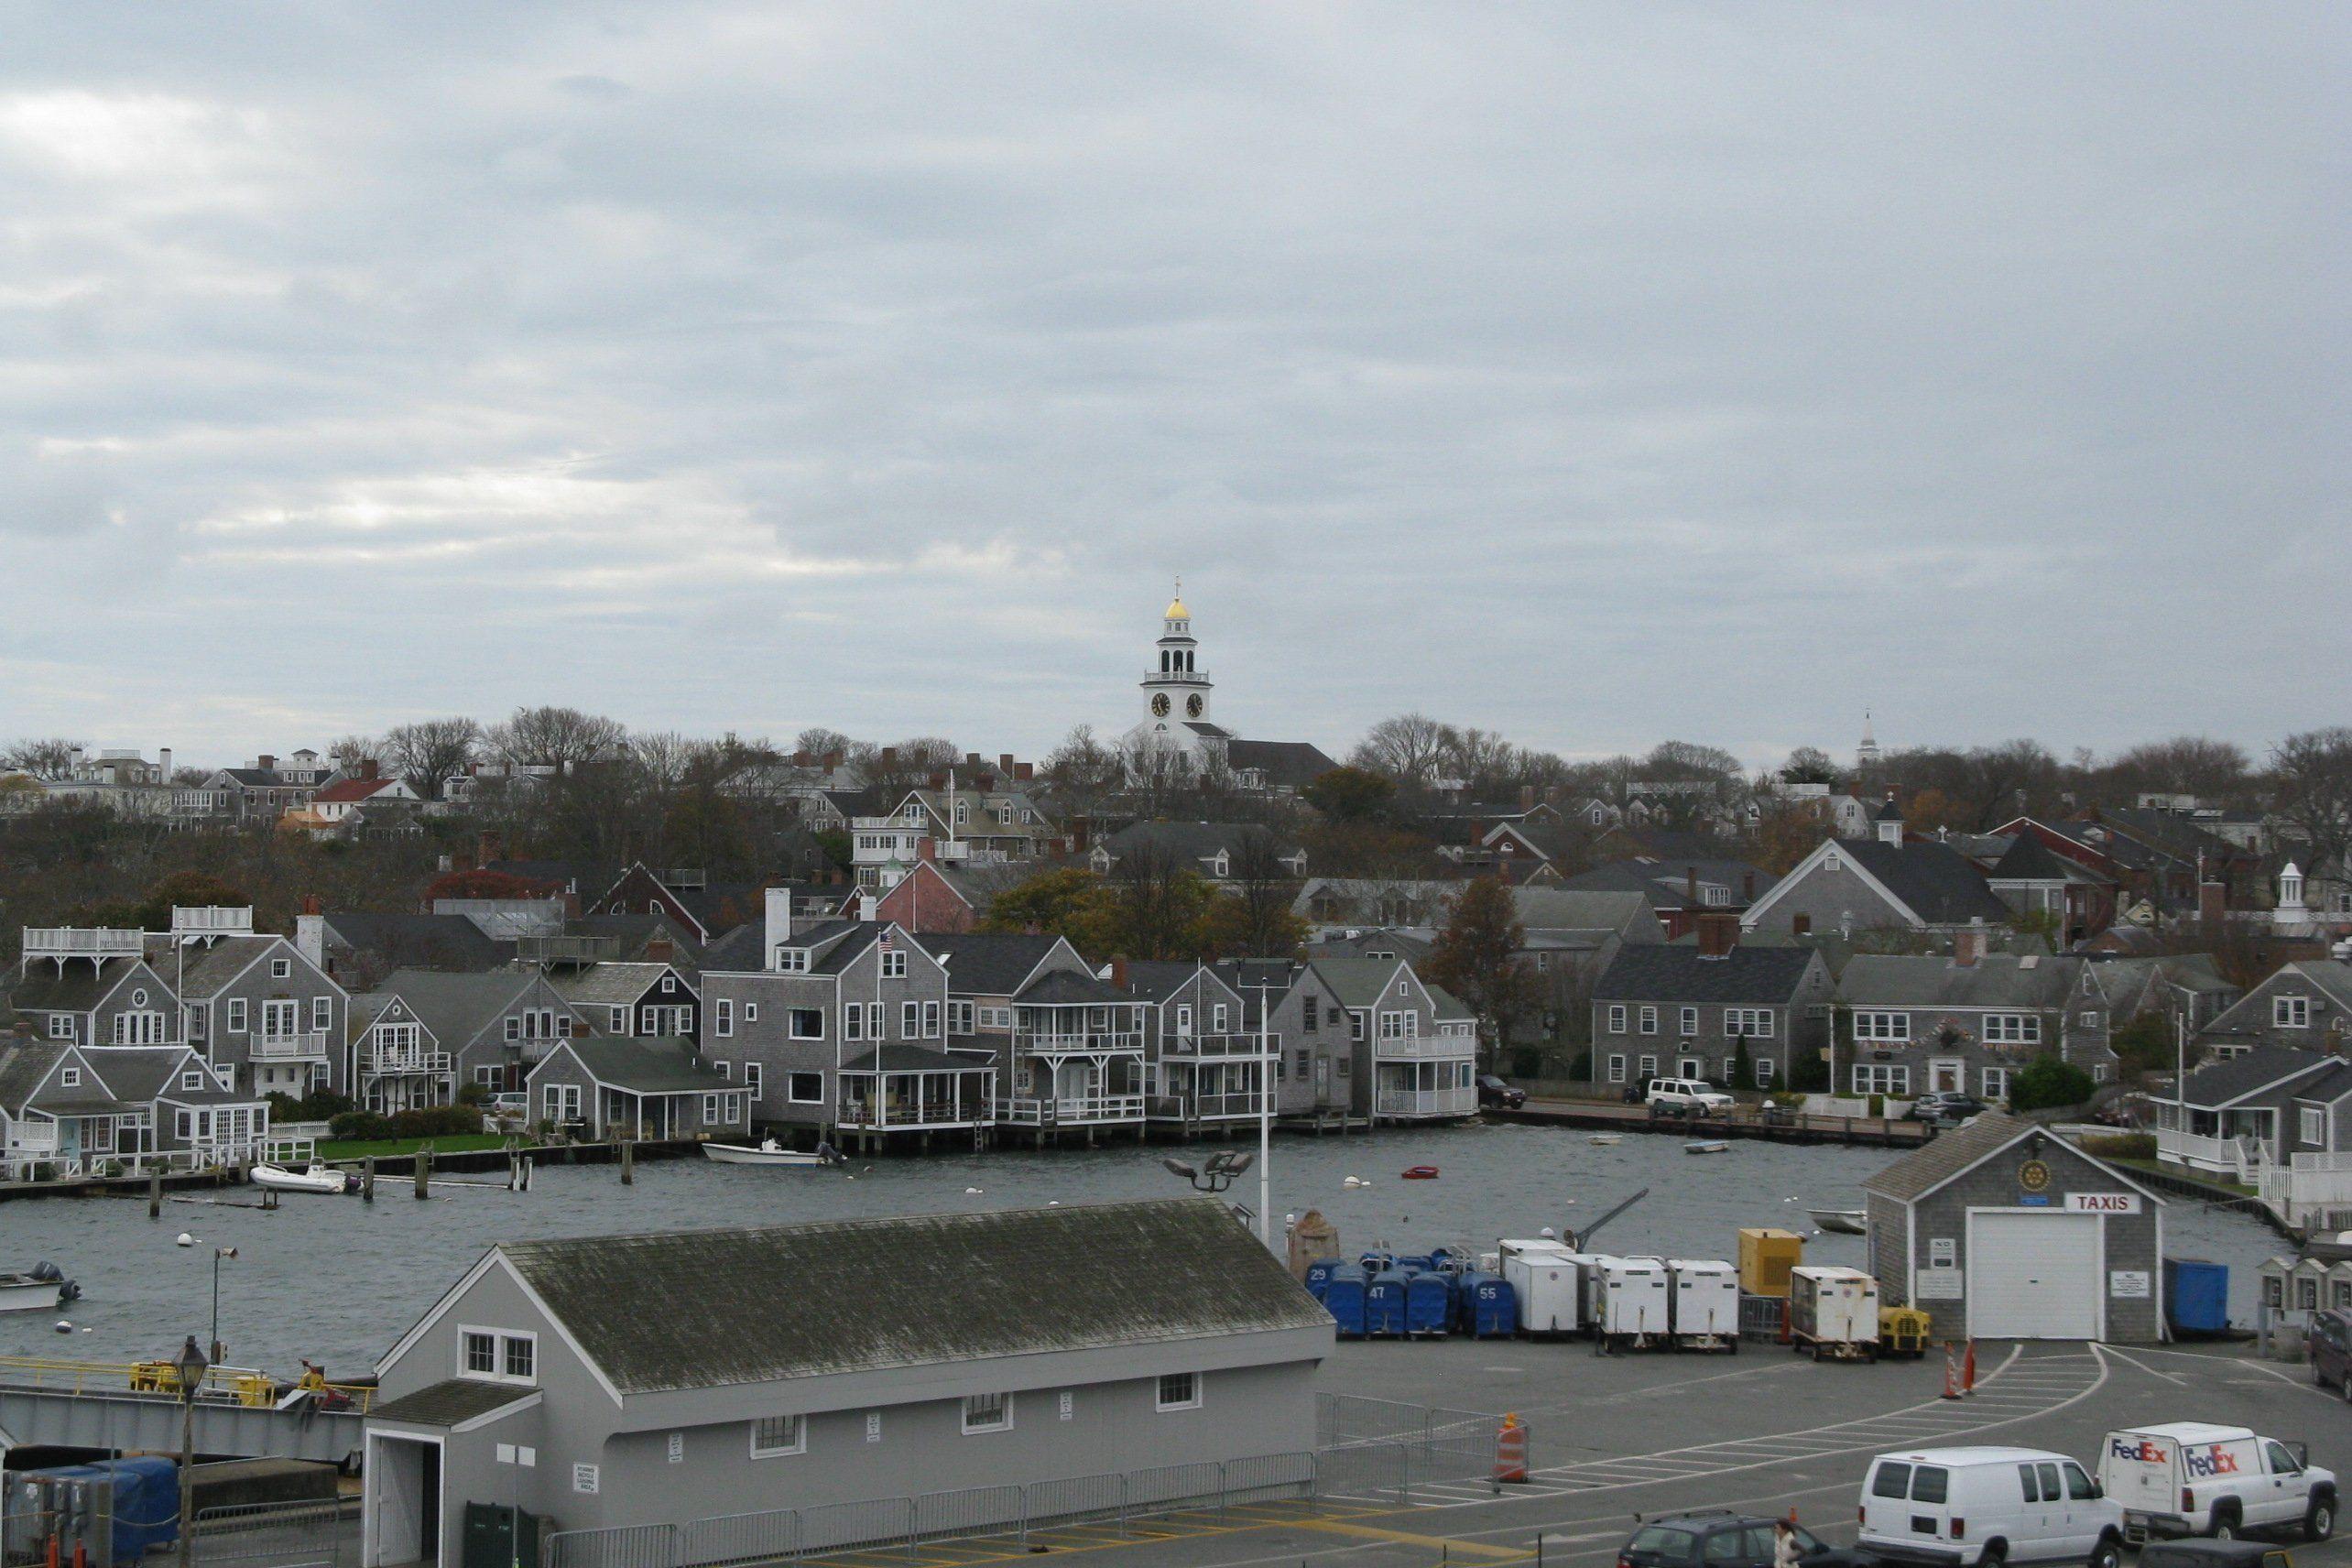 Vista panorámica de Nantucket. Crédito: John Phelan